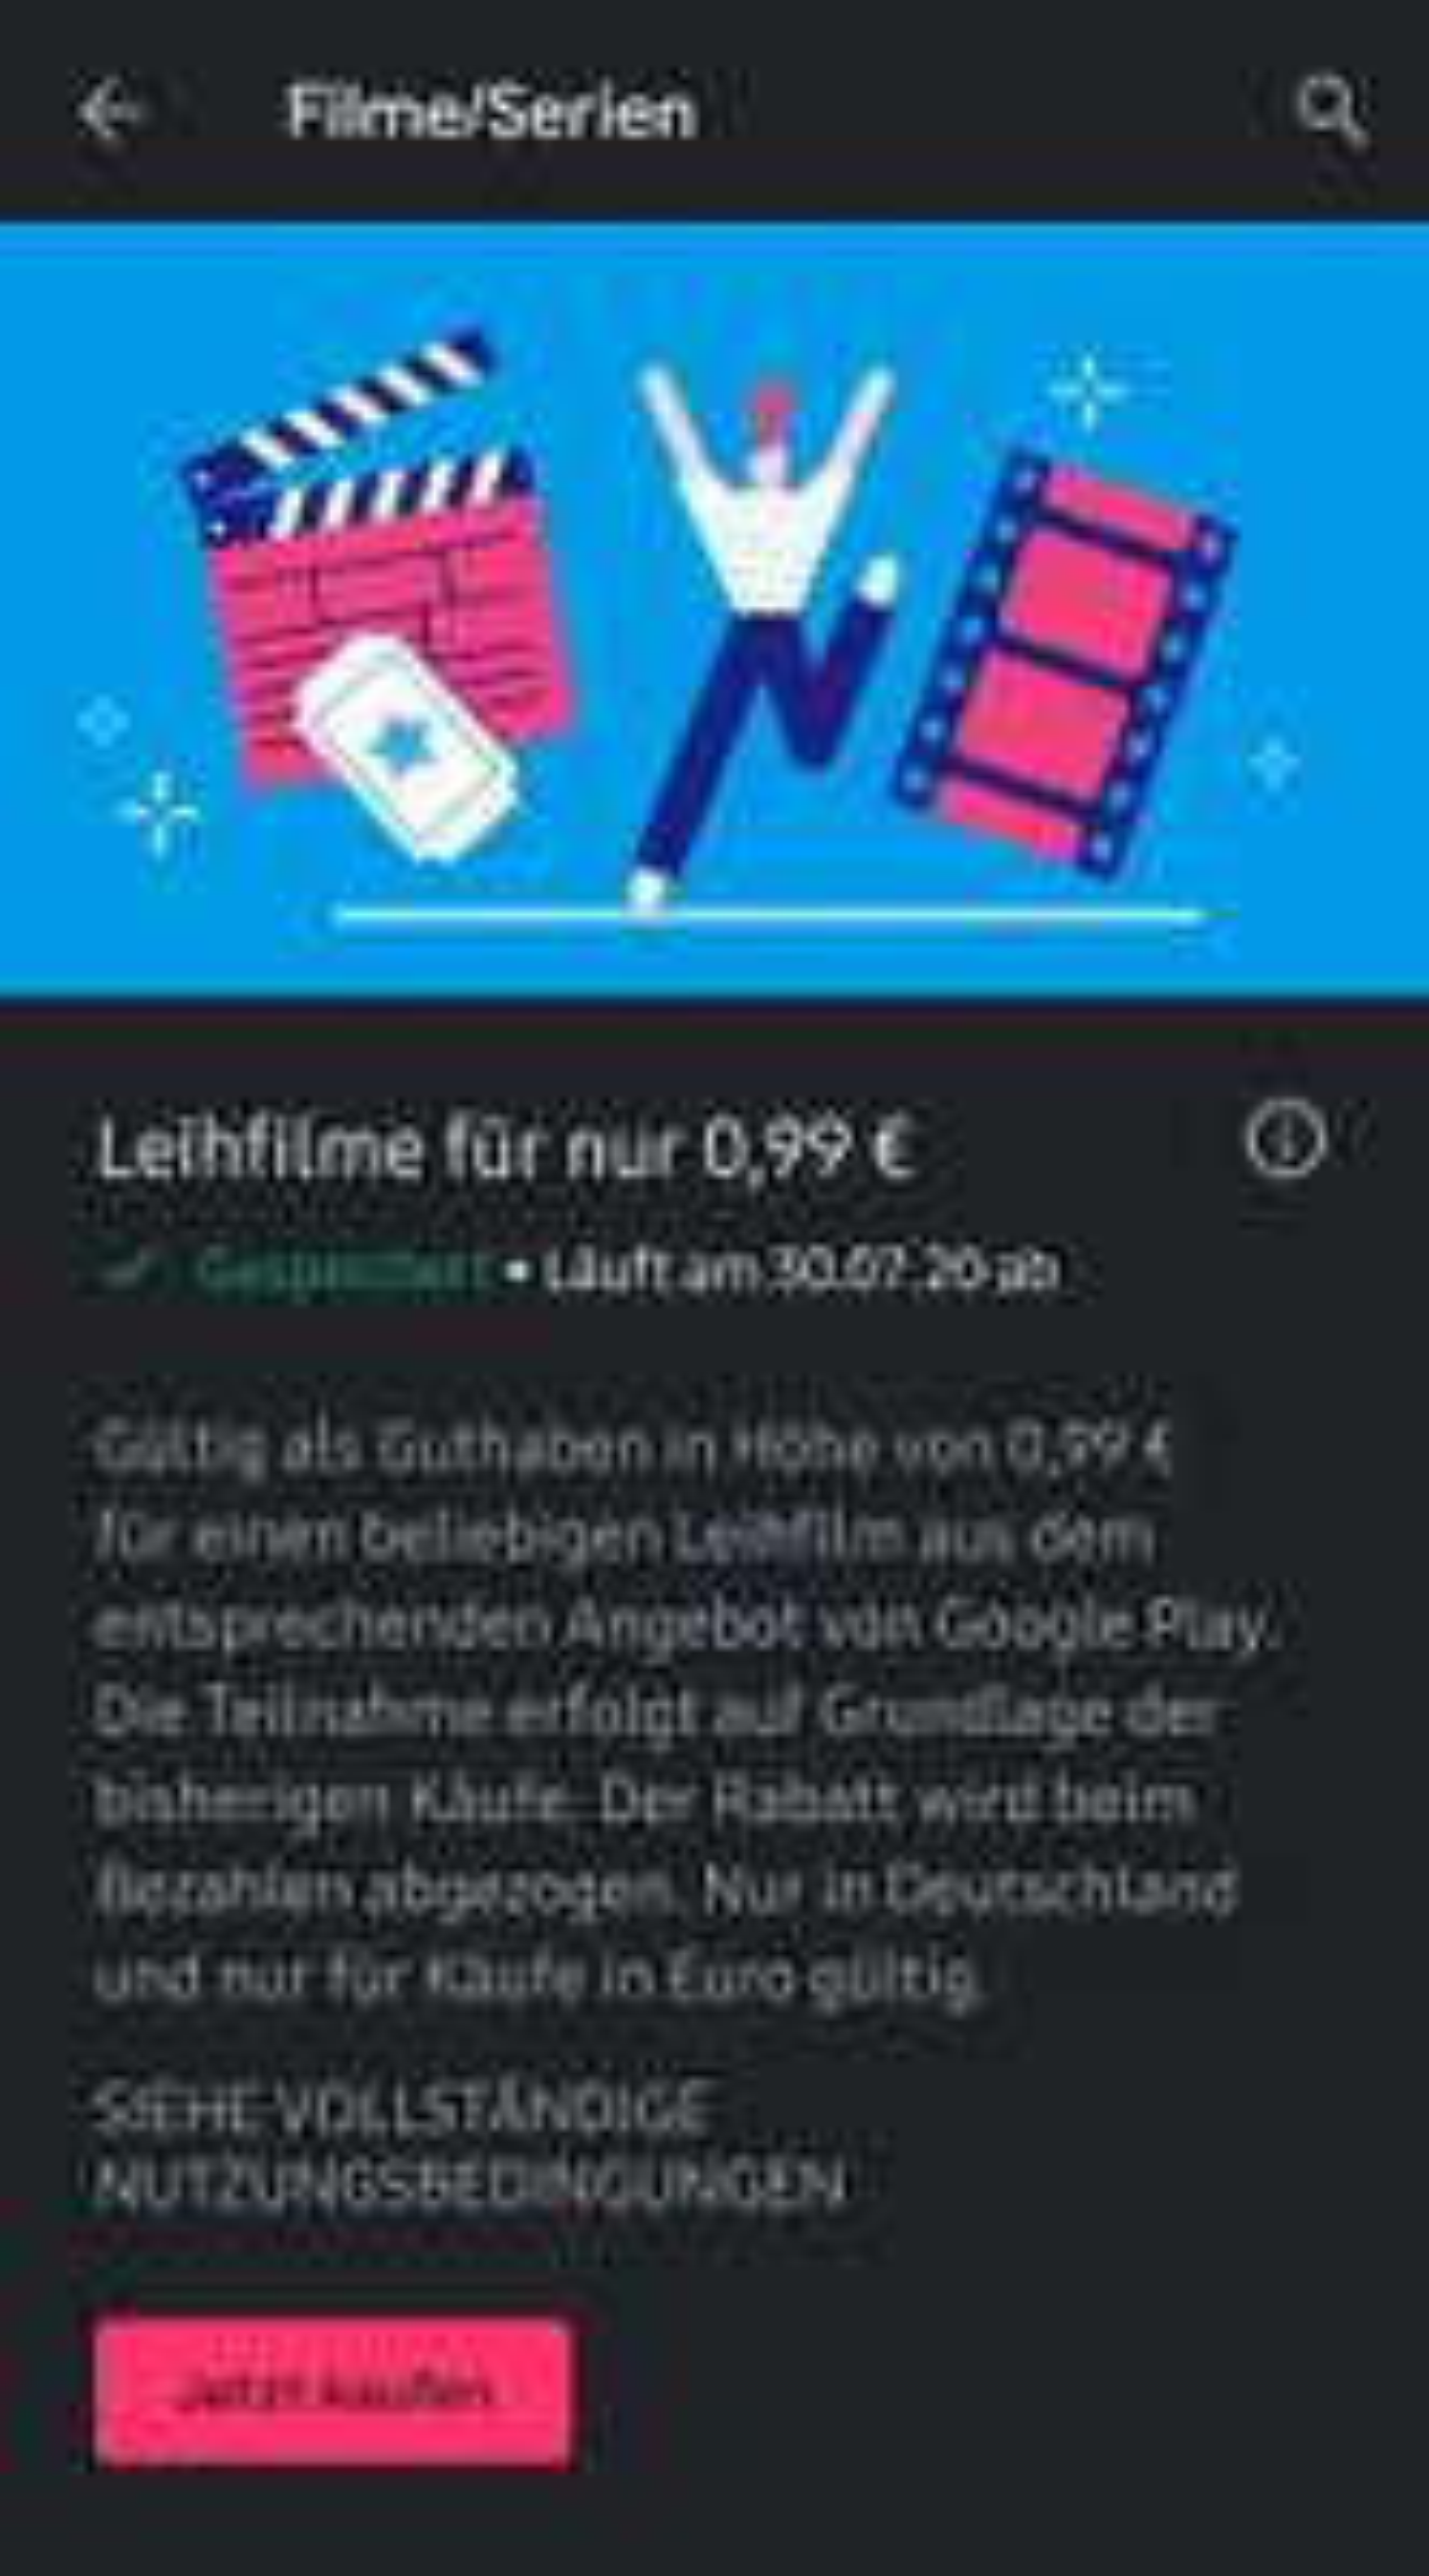 Google Play Filme Leihfilm für 0.99 €